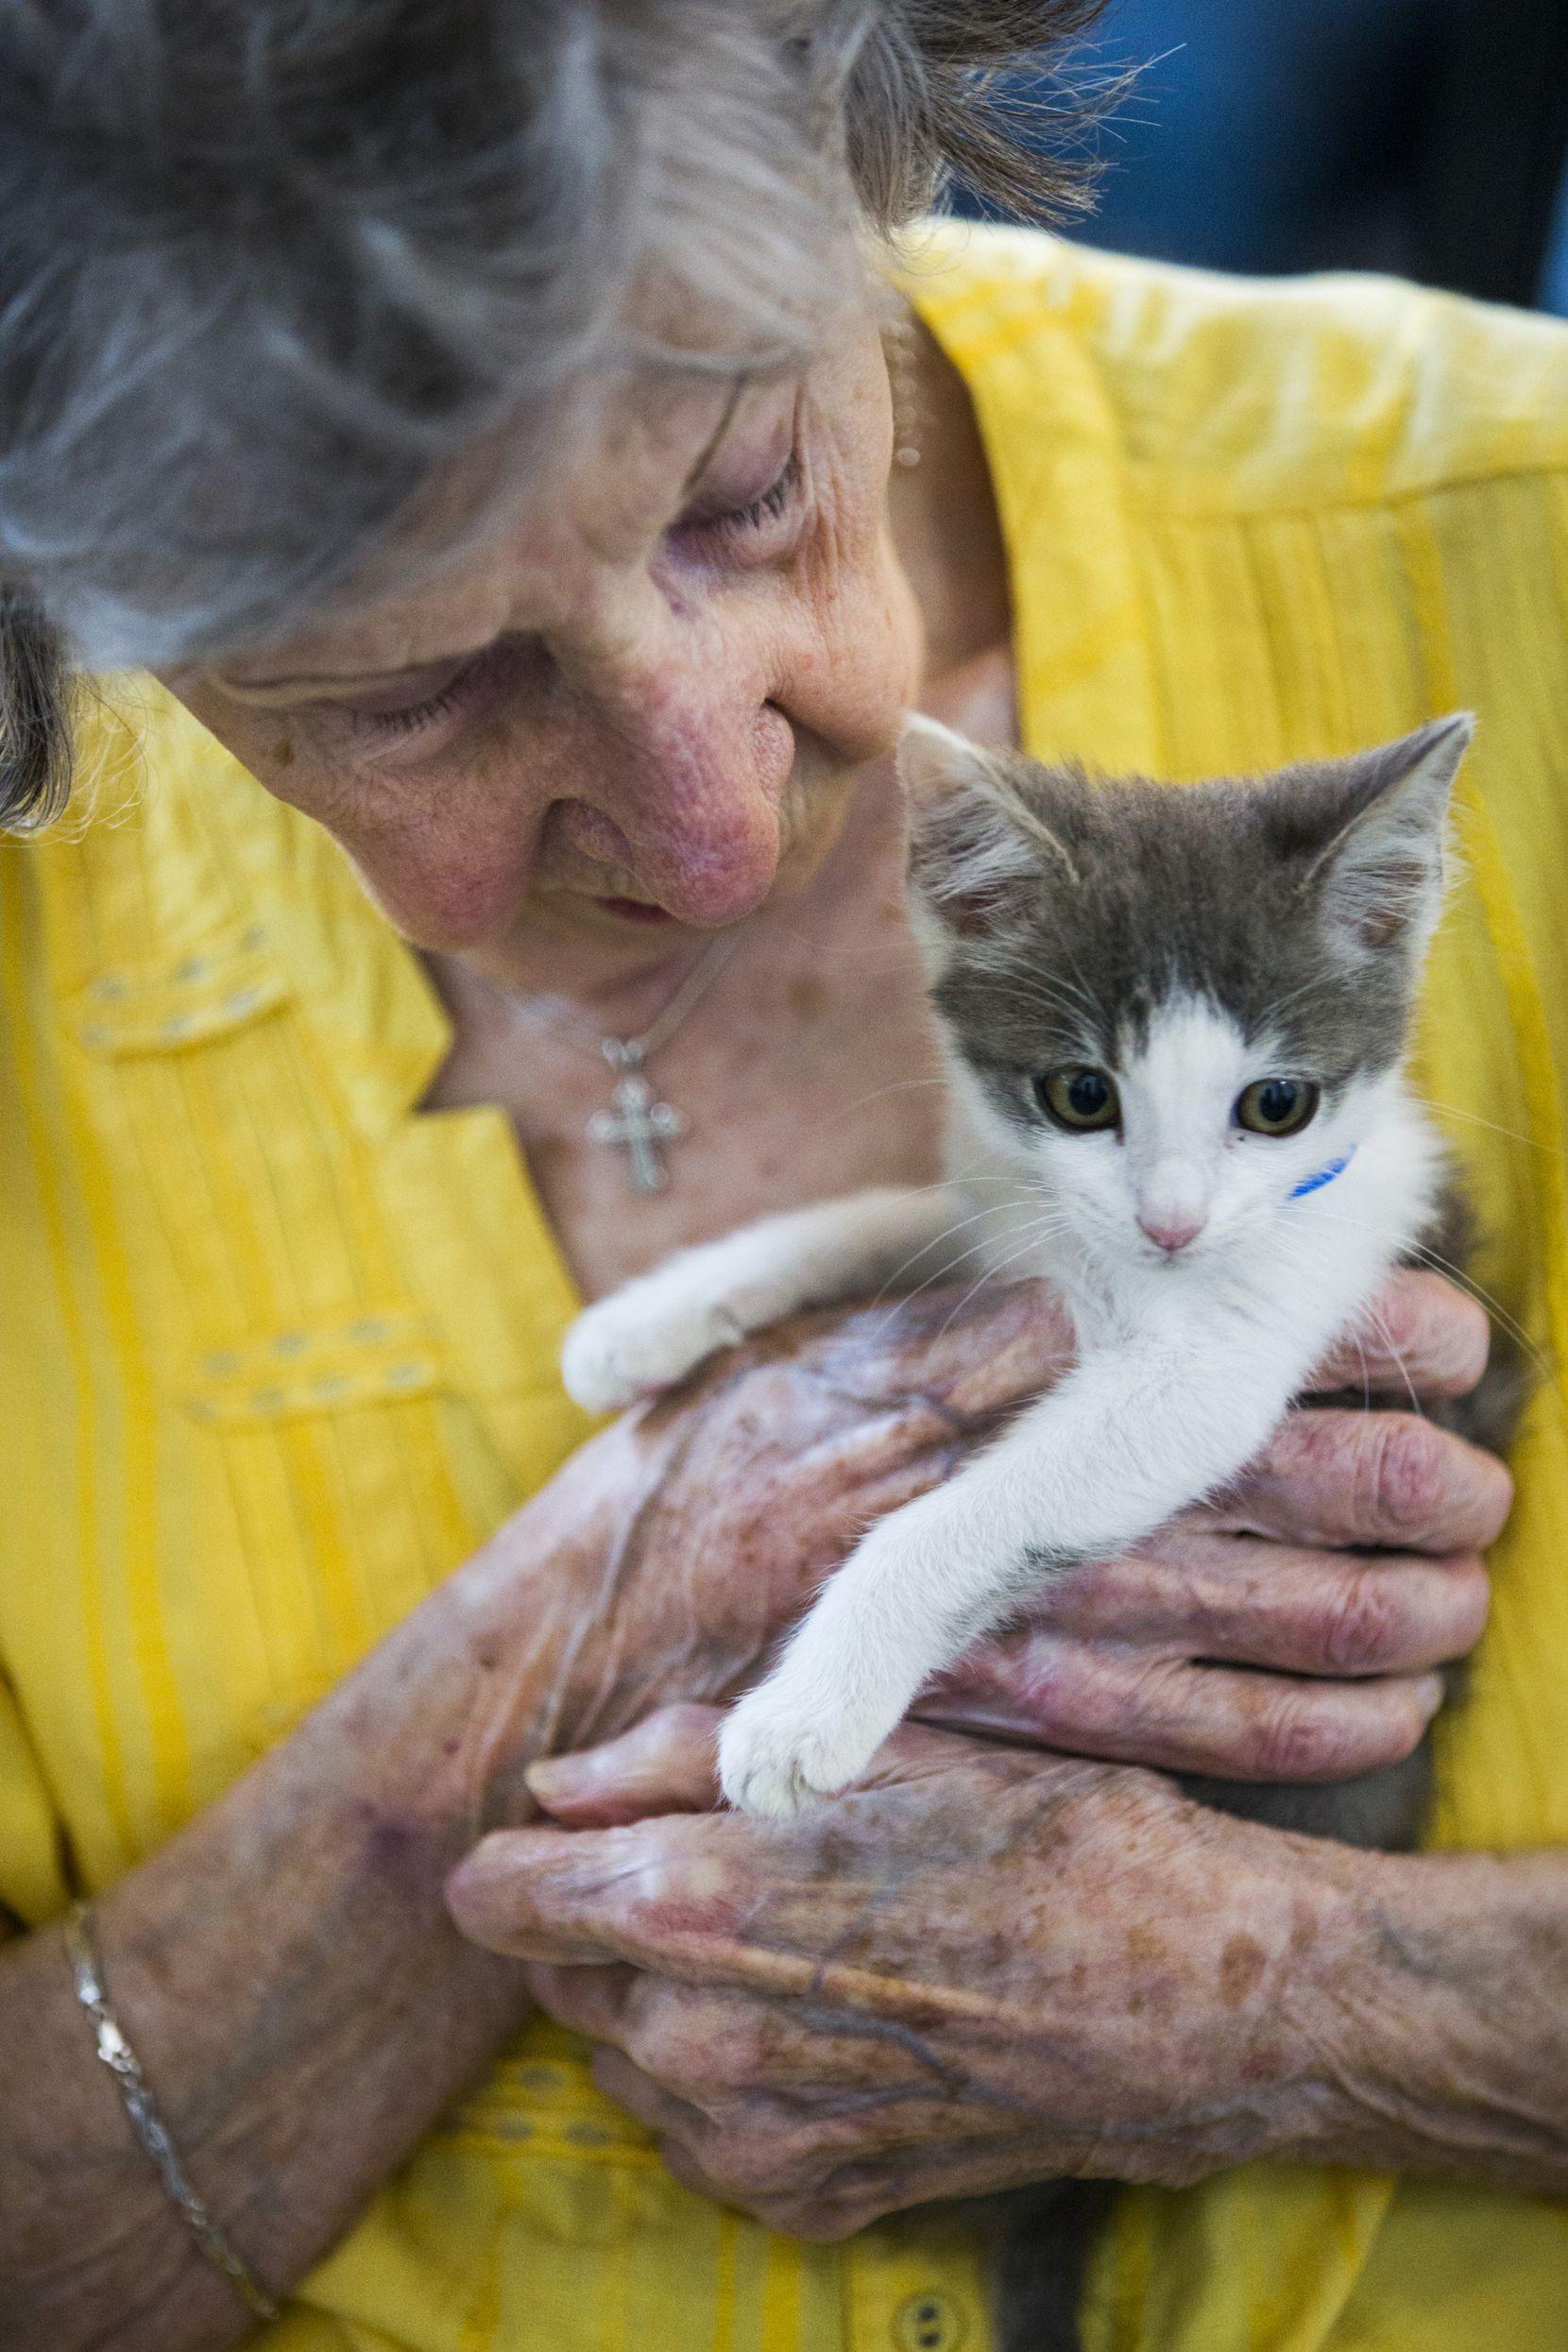 Dottie Lemmond held a kitten before the yoga class.